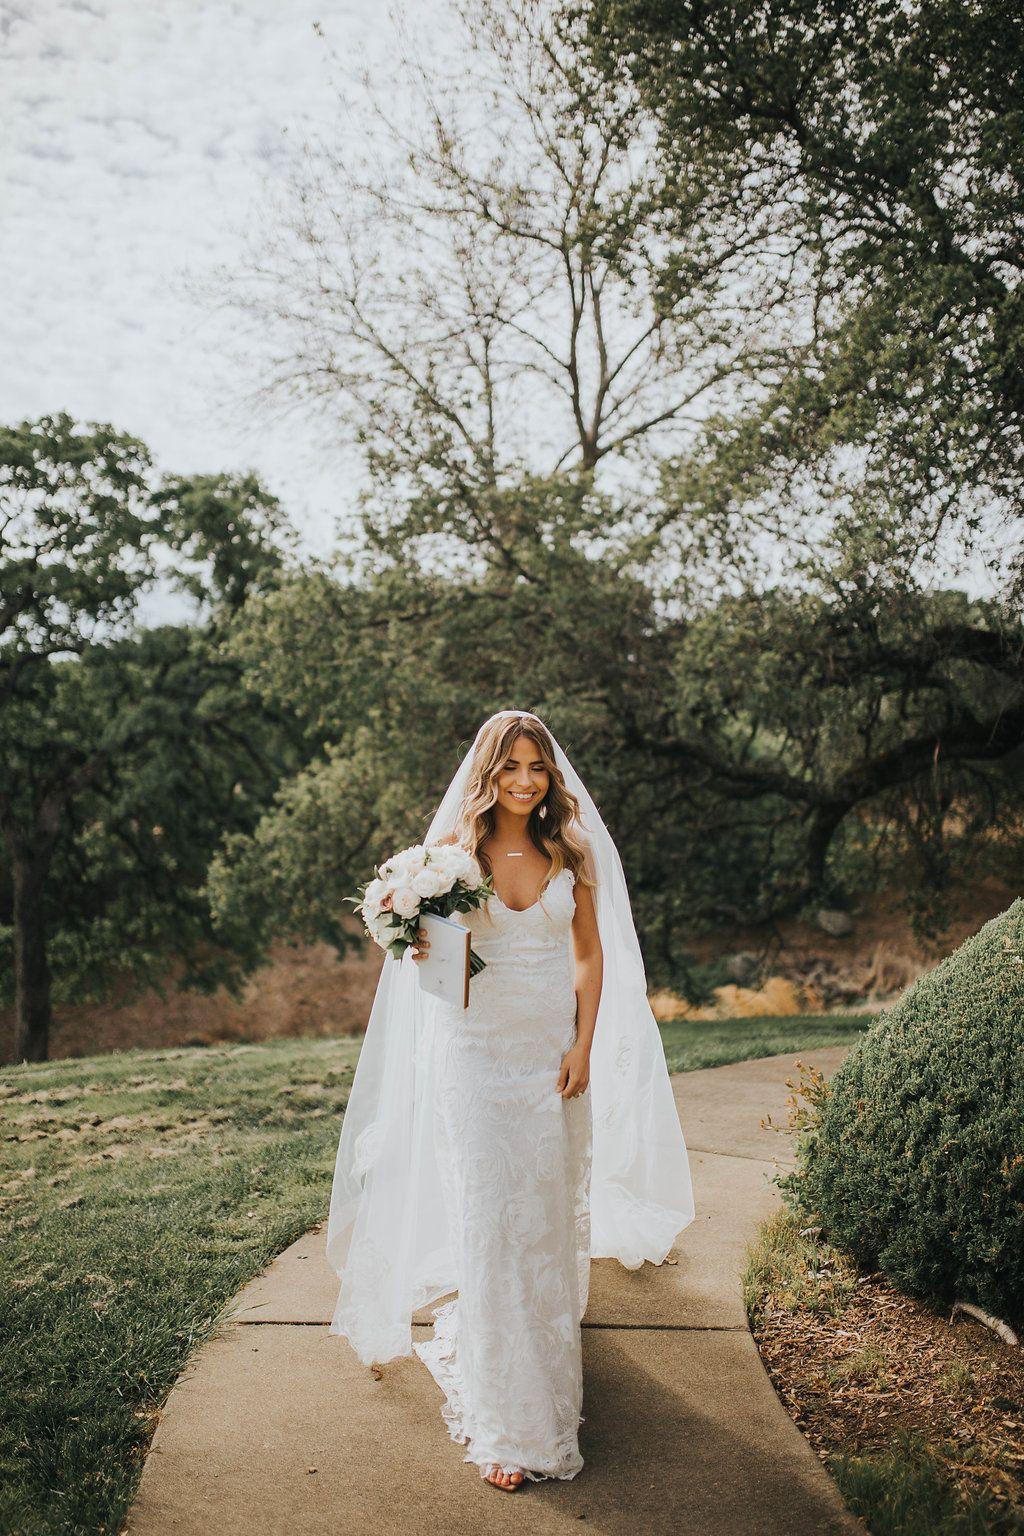 Fleur wedding dress  Oksana in the Rosa Gown u Fleur Veil  Wedding dress and beauty